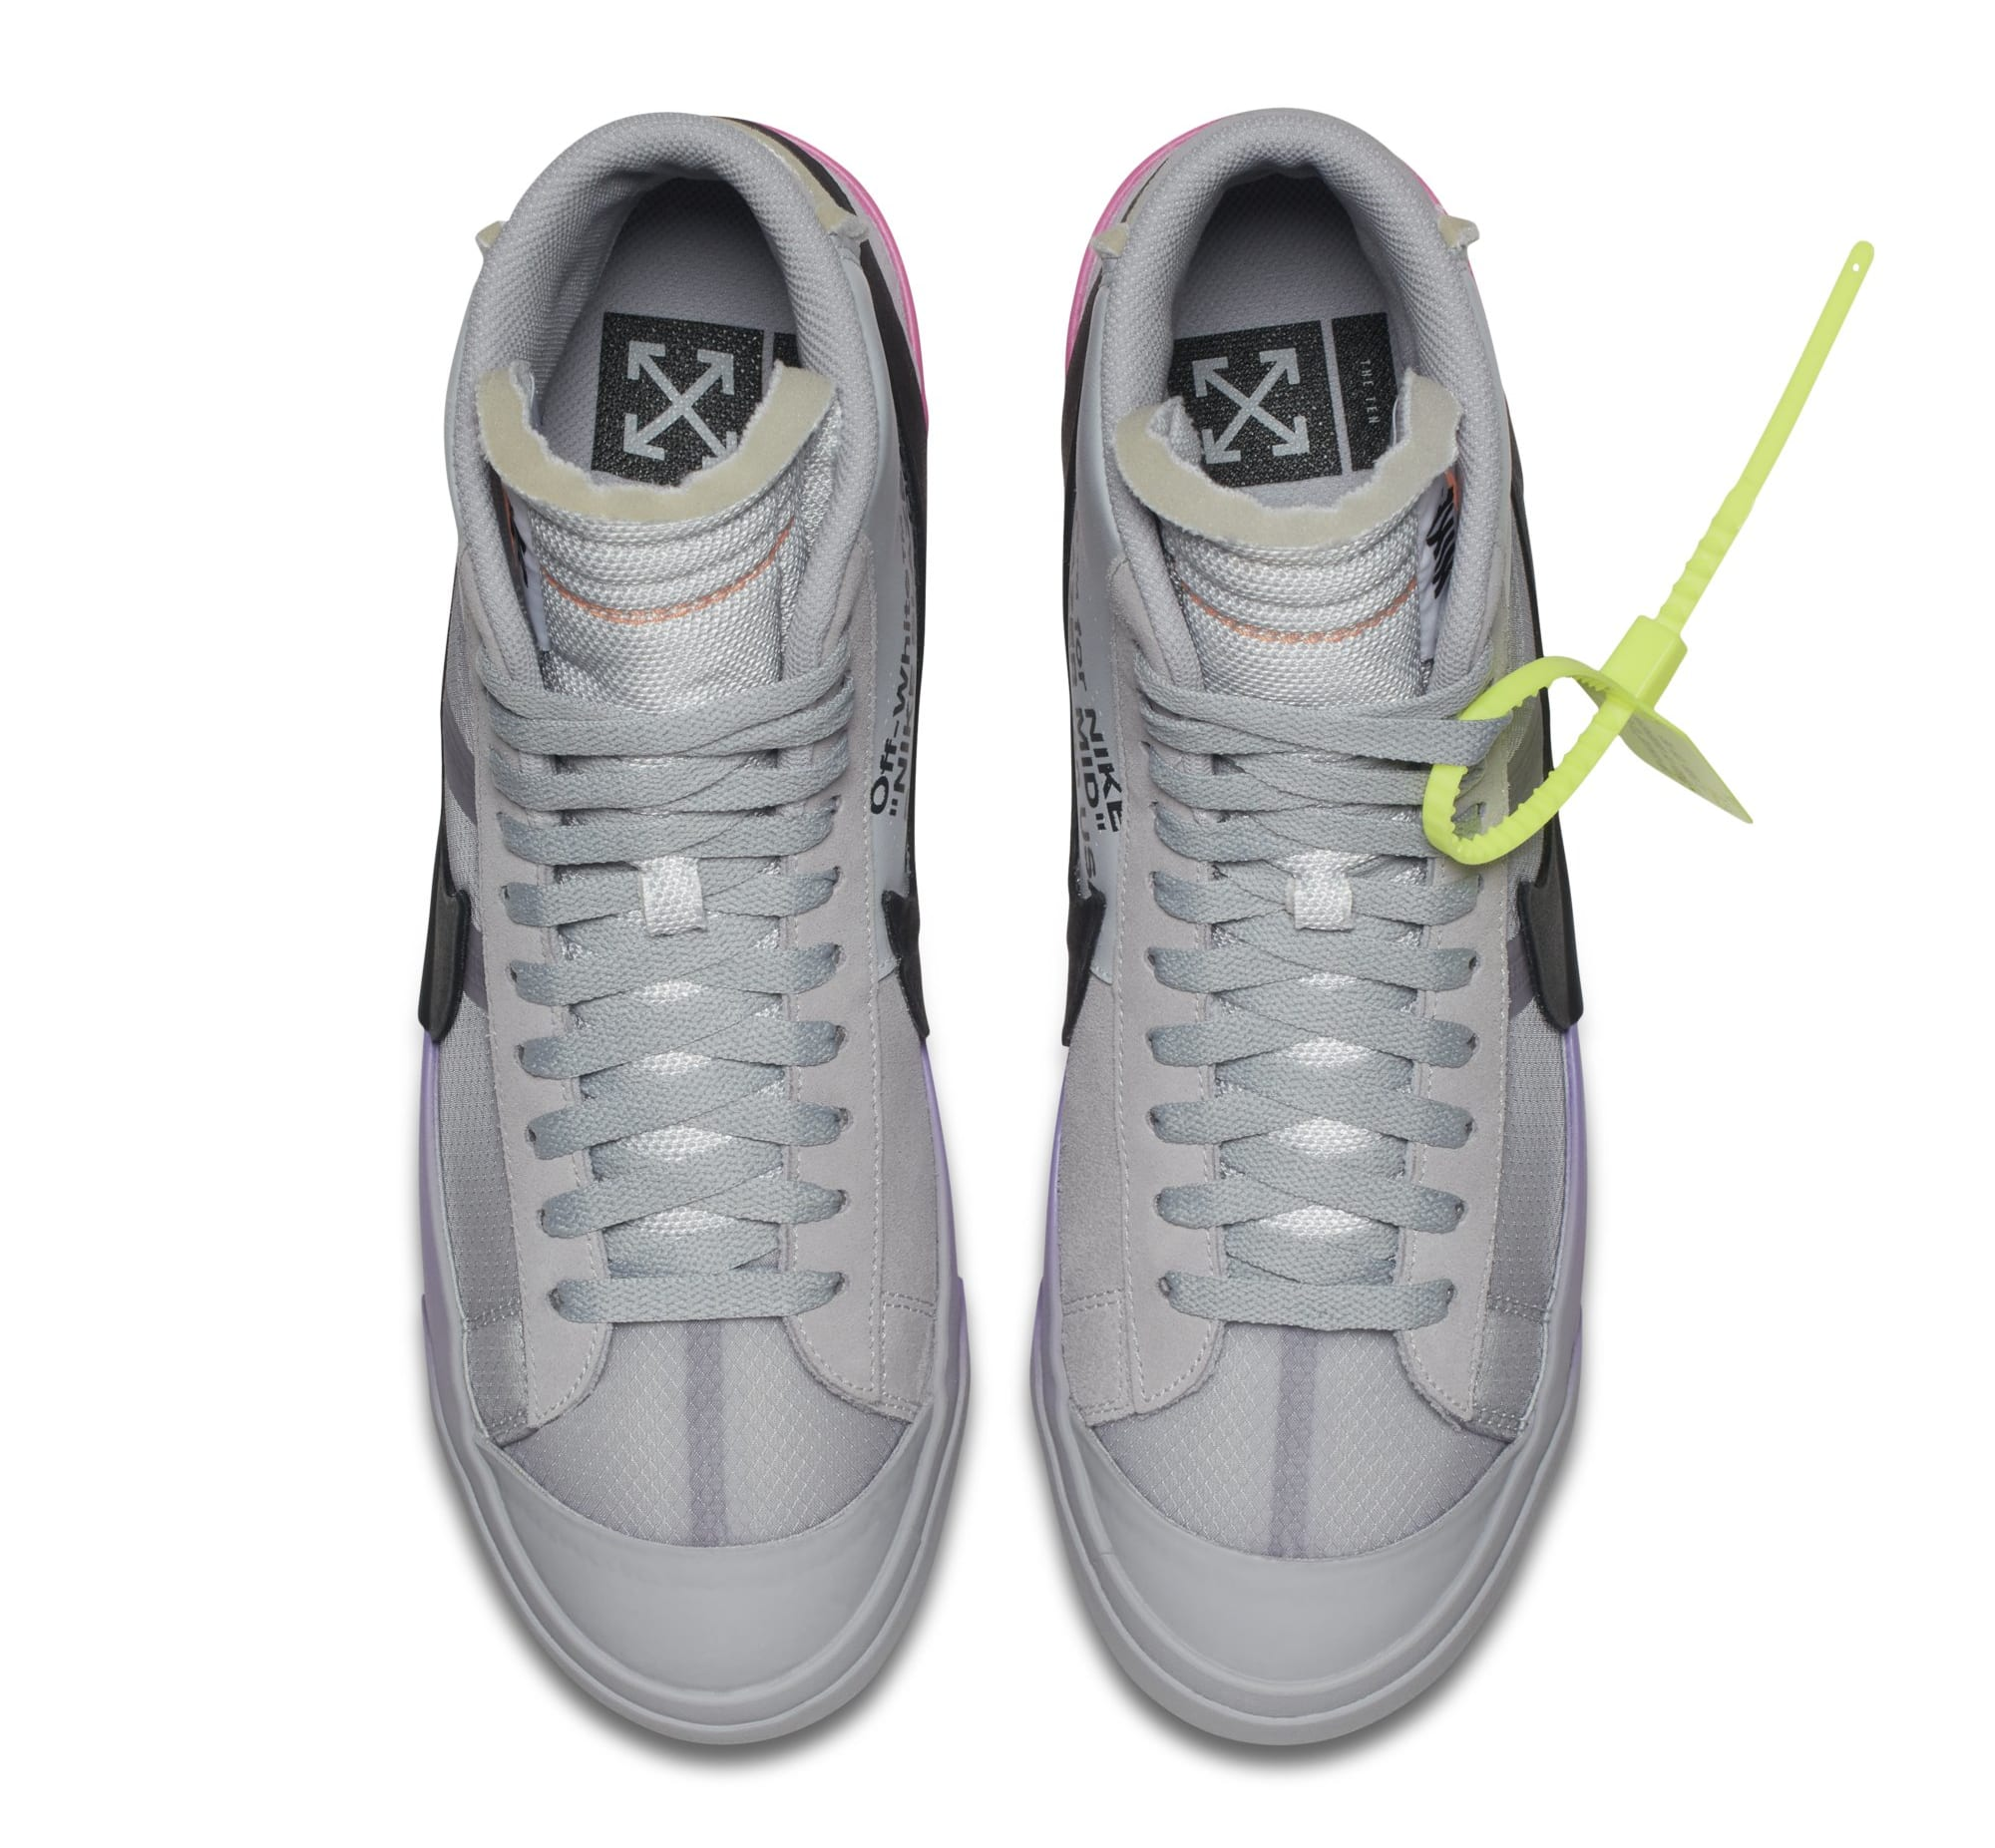 Serena Williams x Off-White x Nike Blazer Mid 'Queen' AA3832-002 (Top)